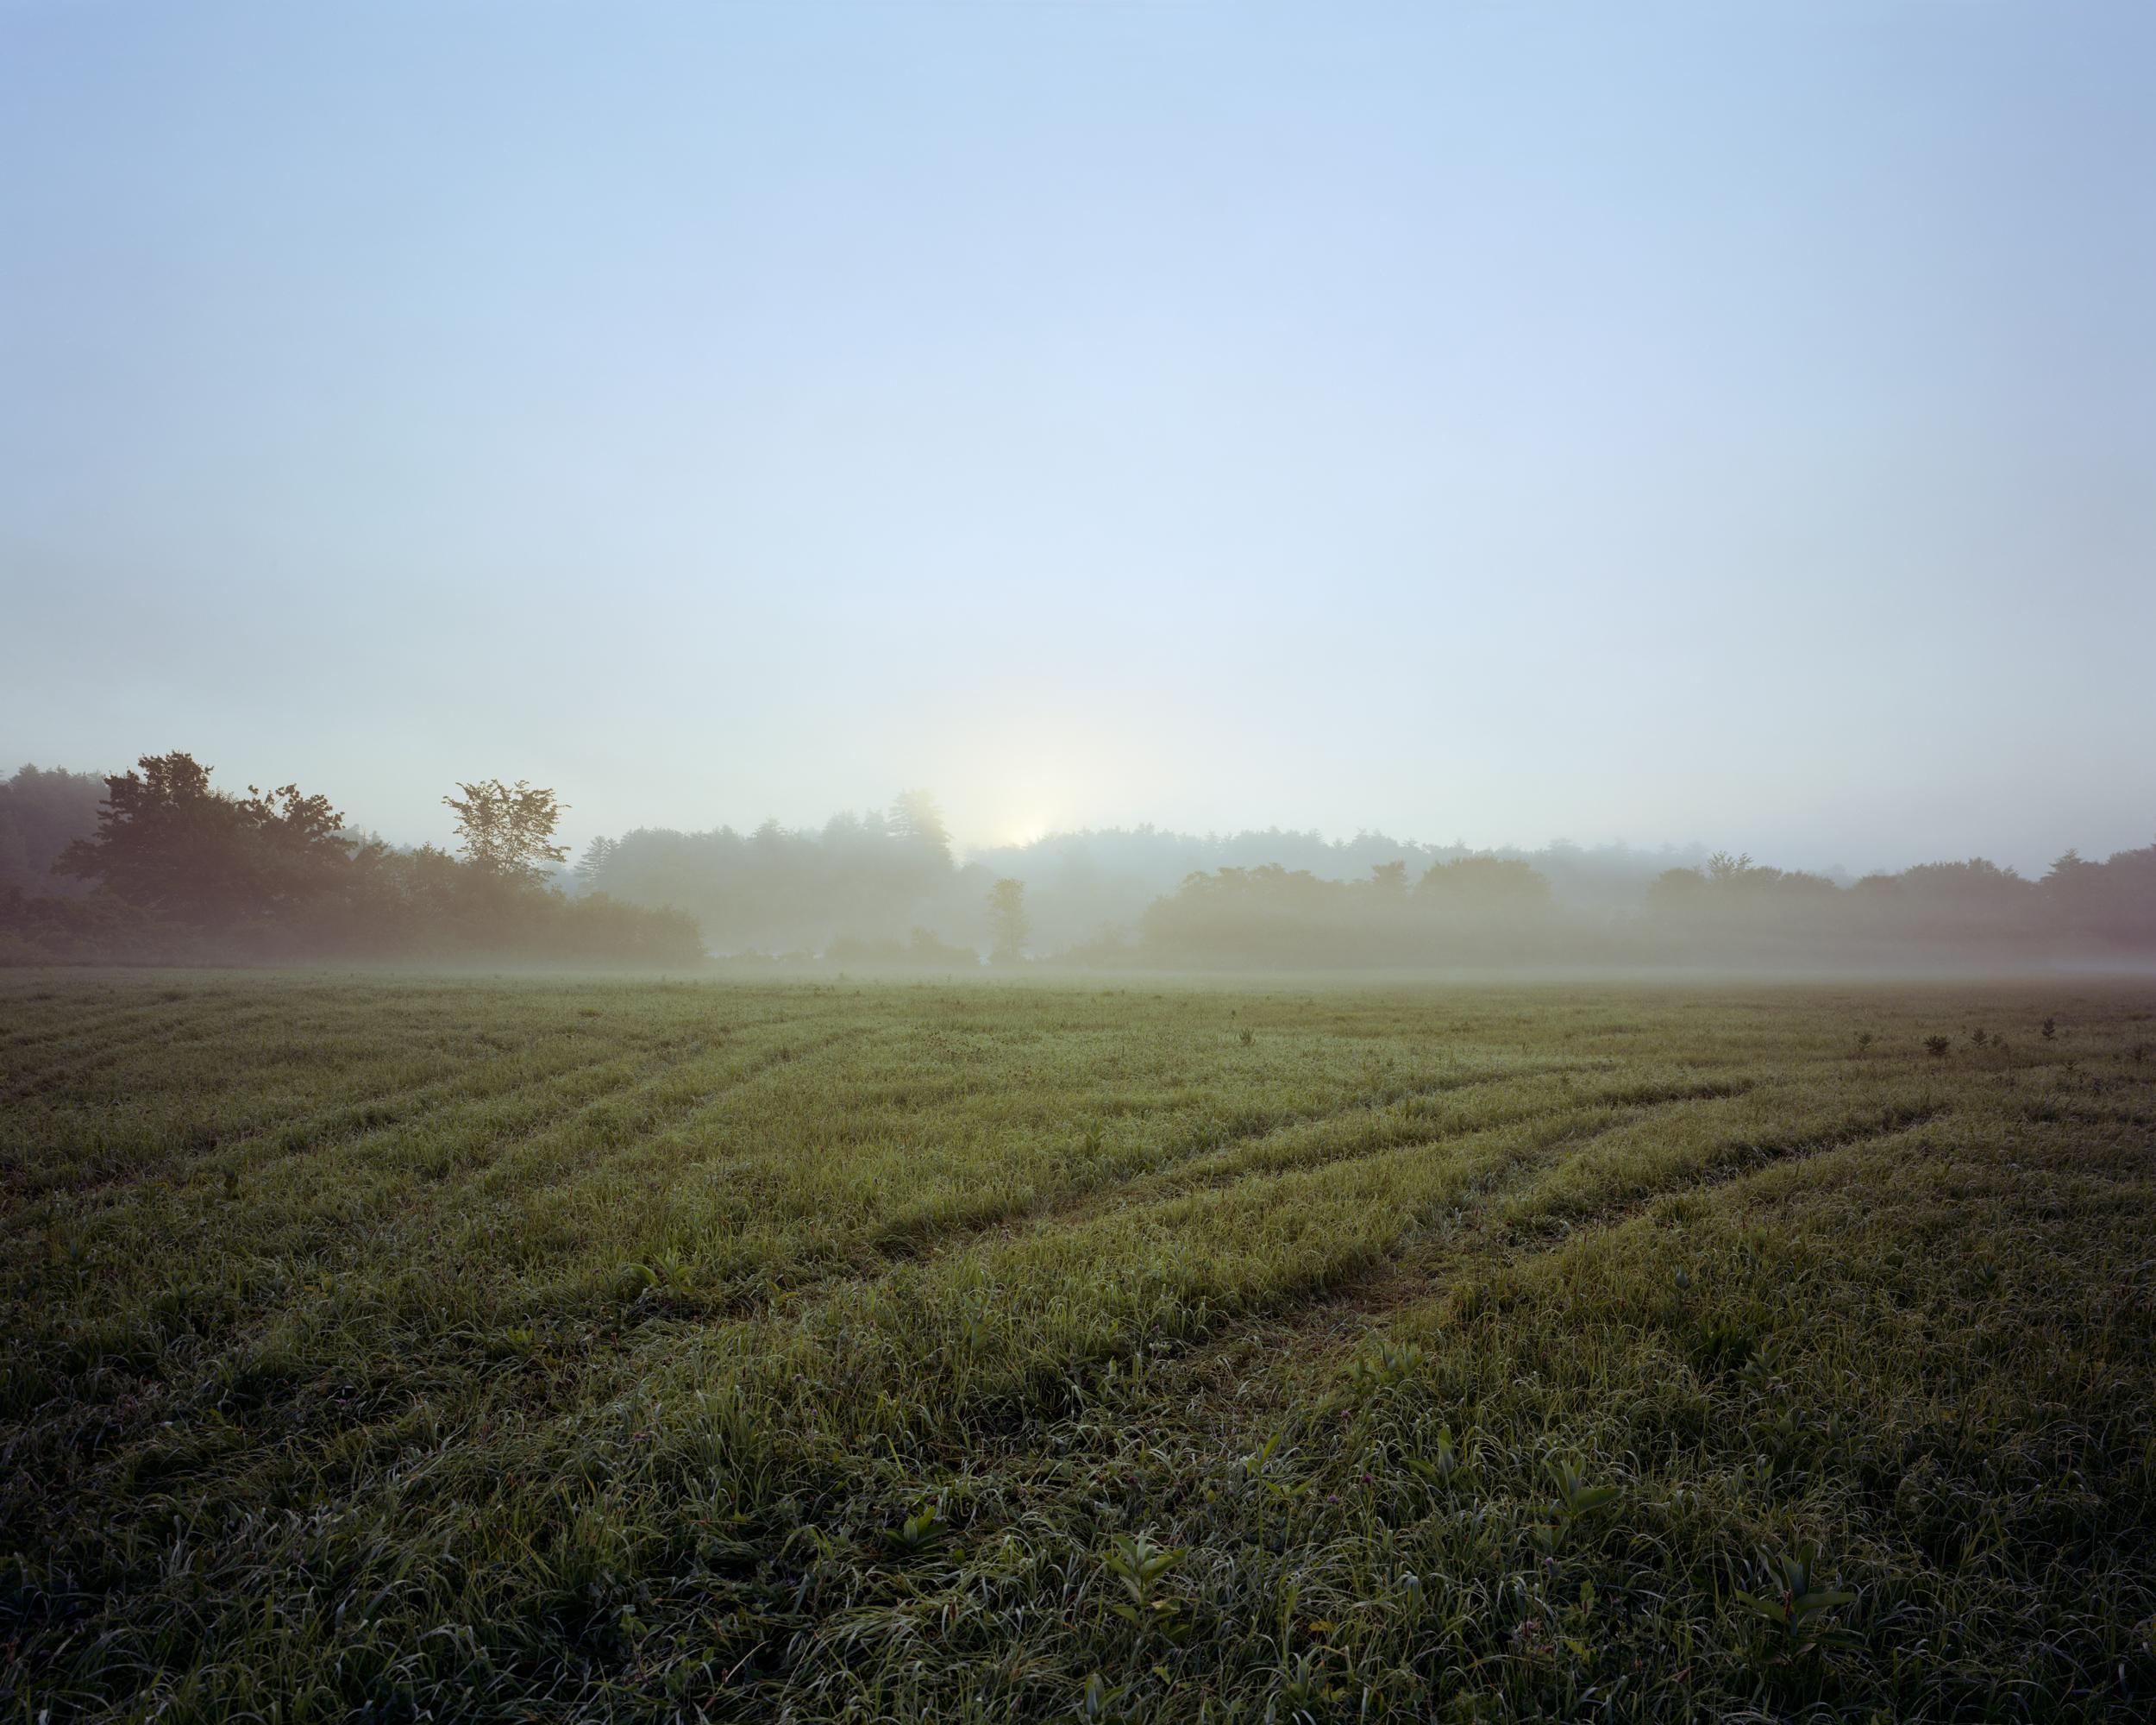 03-411 Meadow, sunrise, tractor tracks in grass, full.jpg